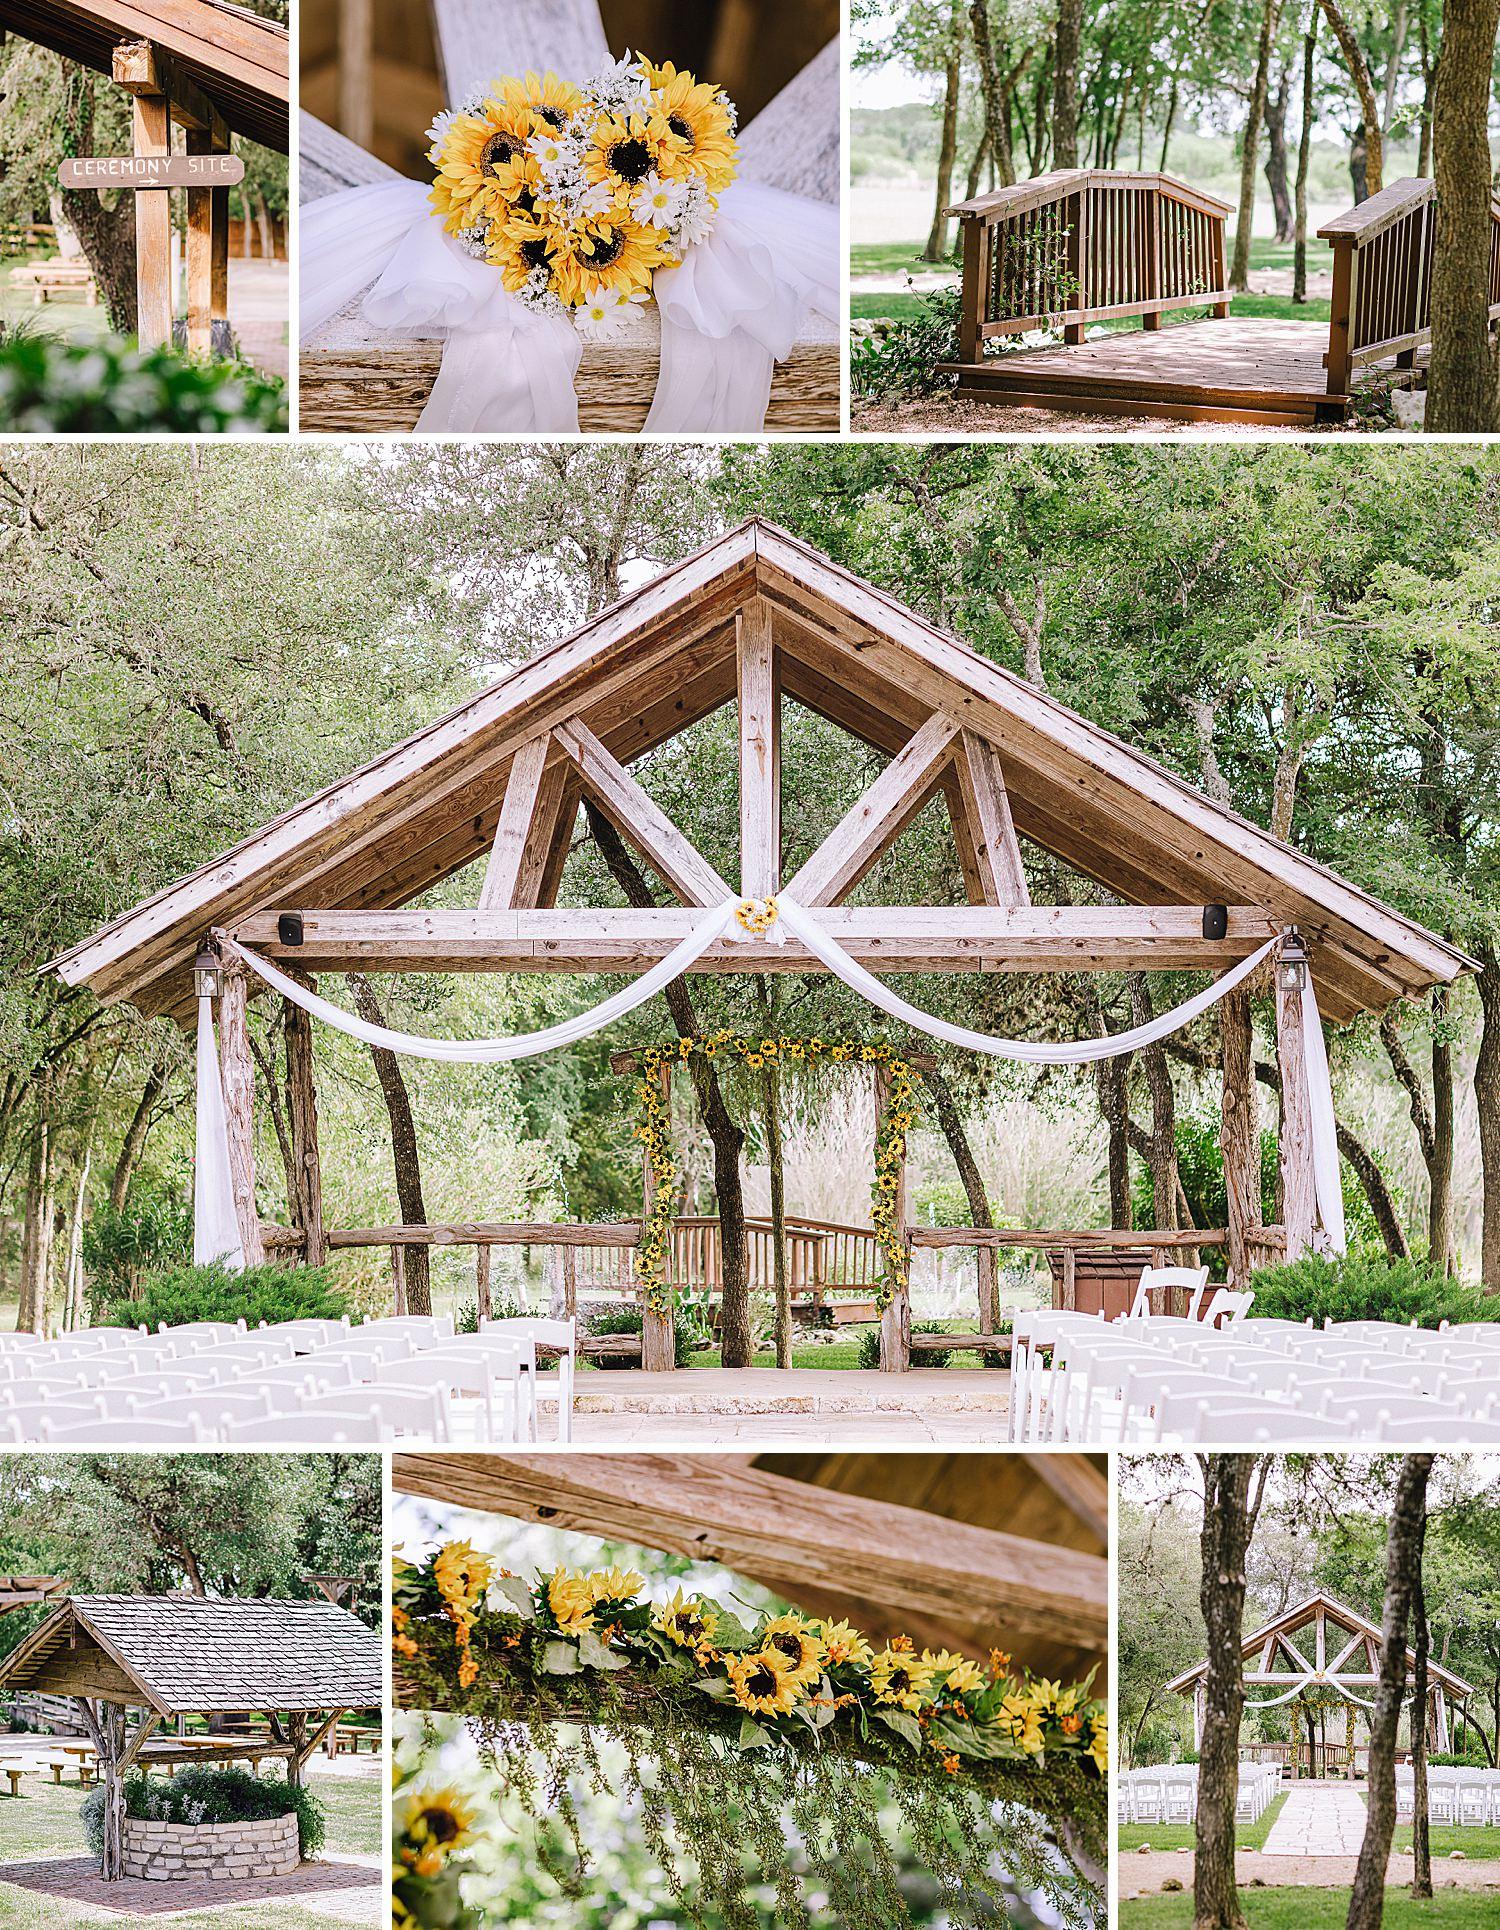 Carly-Barton-Photography-Old-Town-Texas-Rustic-Wedding-Photos-Sunflowers-Boots-Kyle-Texas_0015.jpg